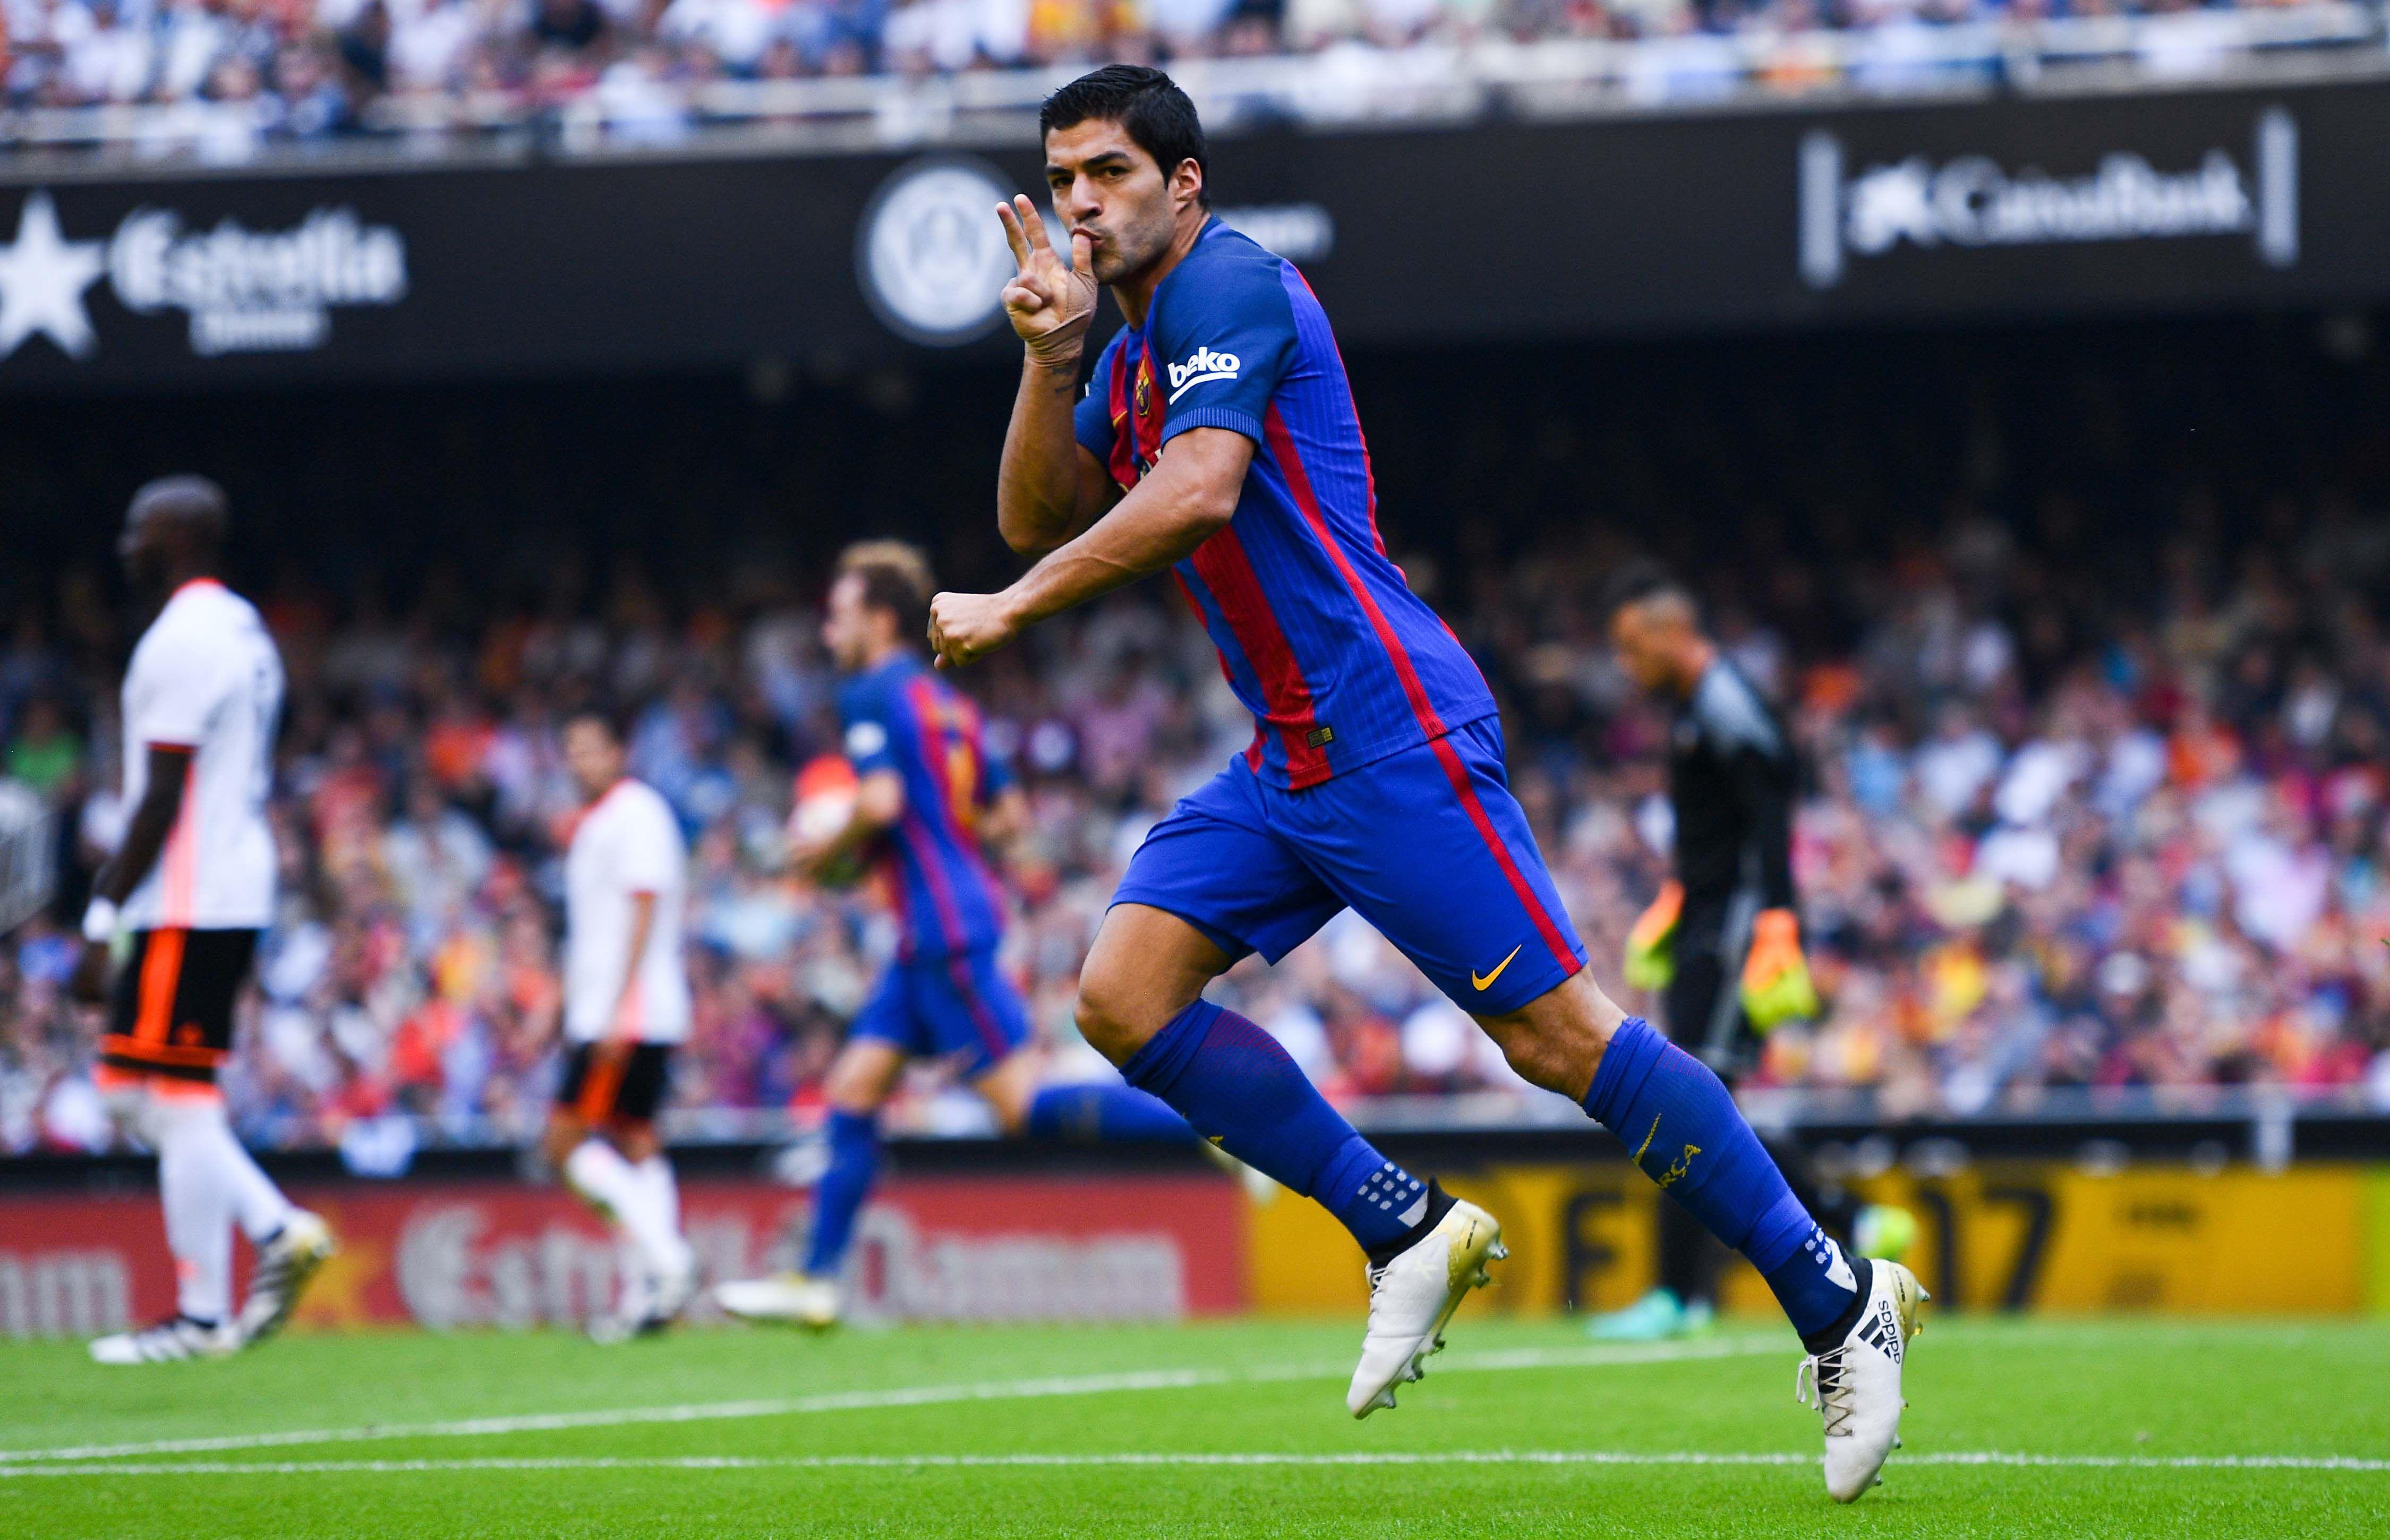 Arsenal: Alexis Sanchez Becoming Luis Suarez Type Figure